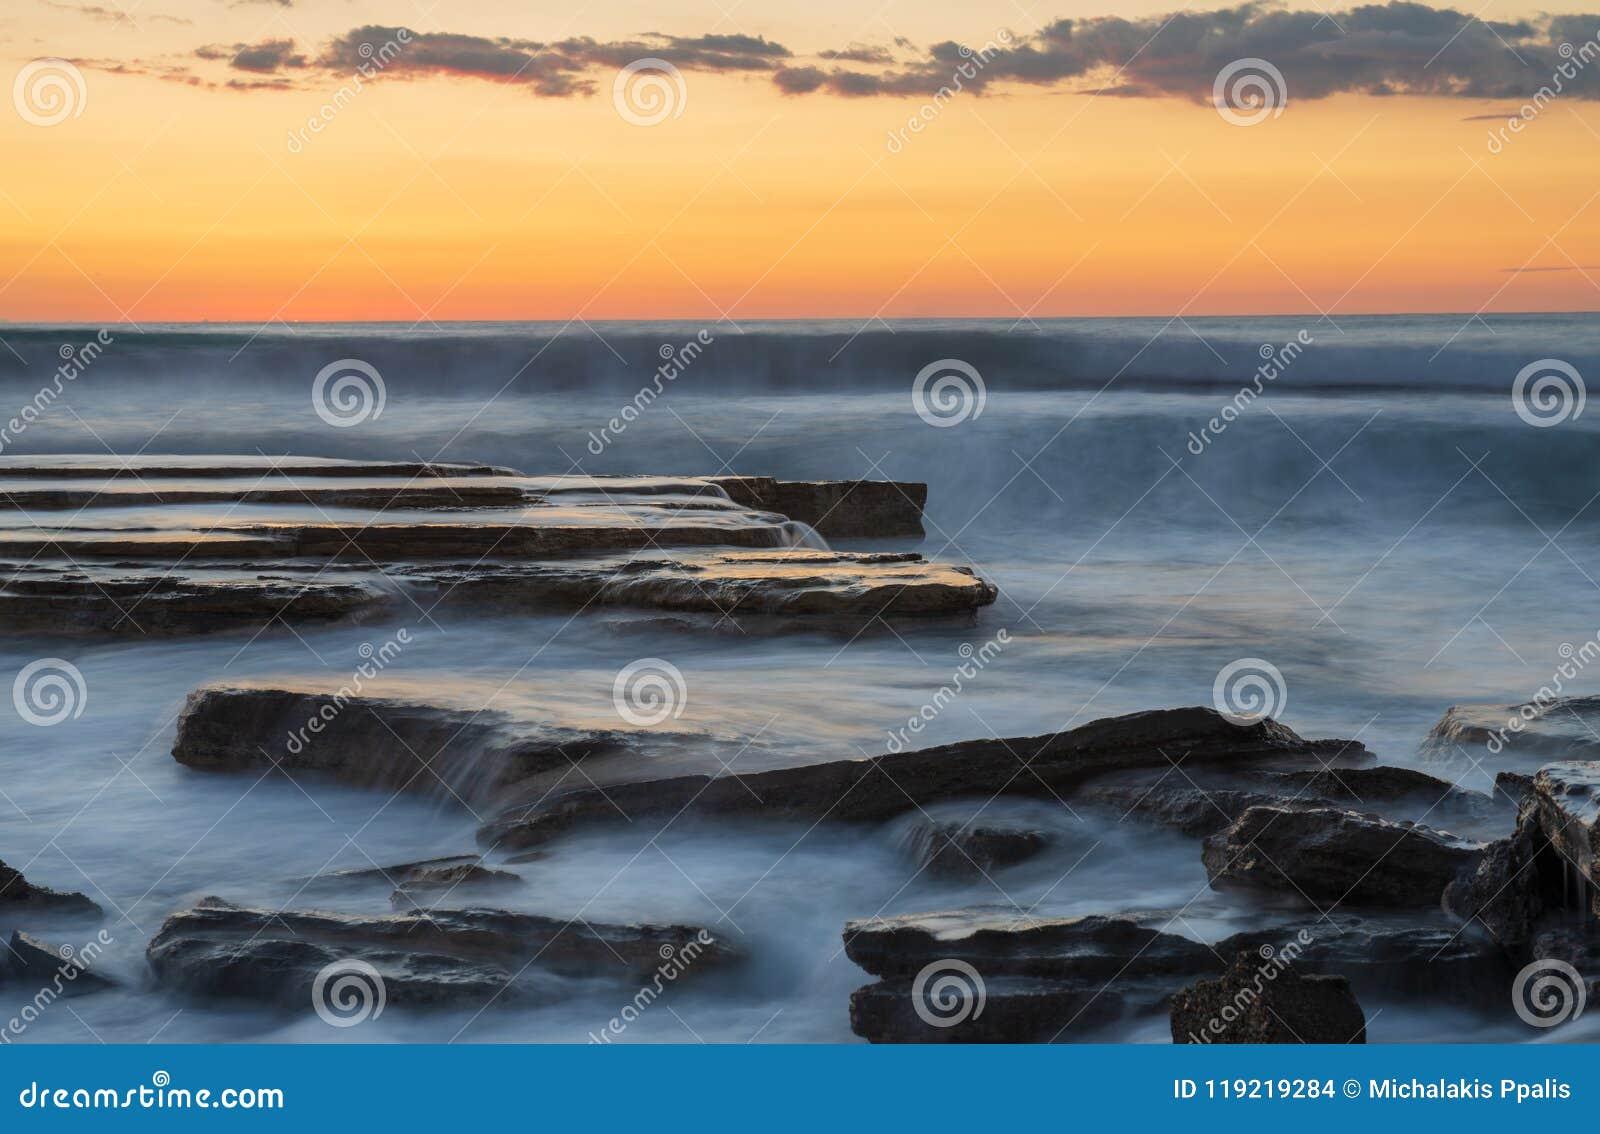 Красивый драматический заход солнца над скалистым побережьем